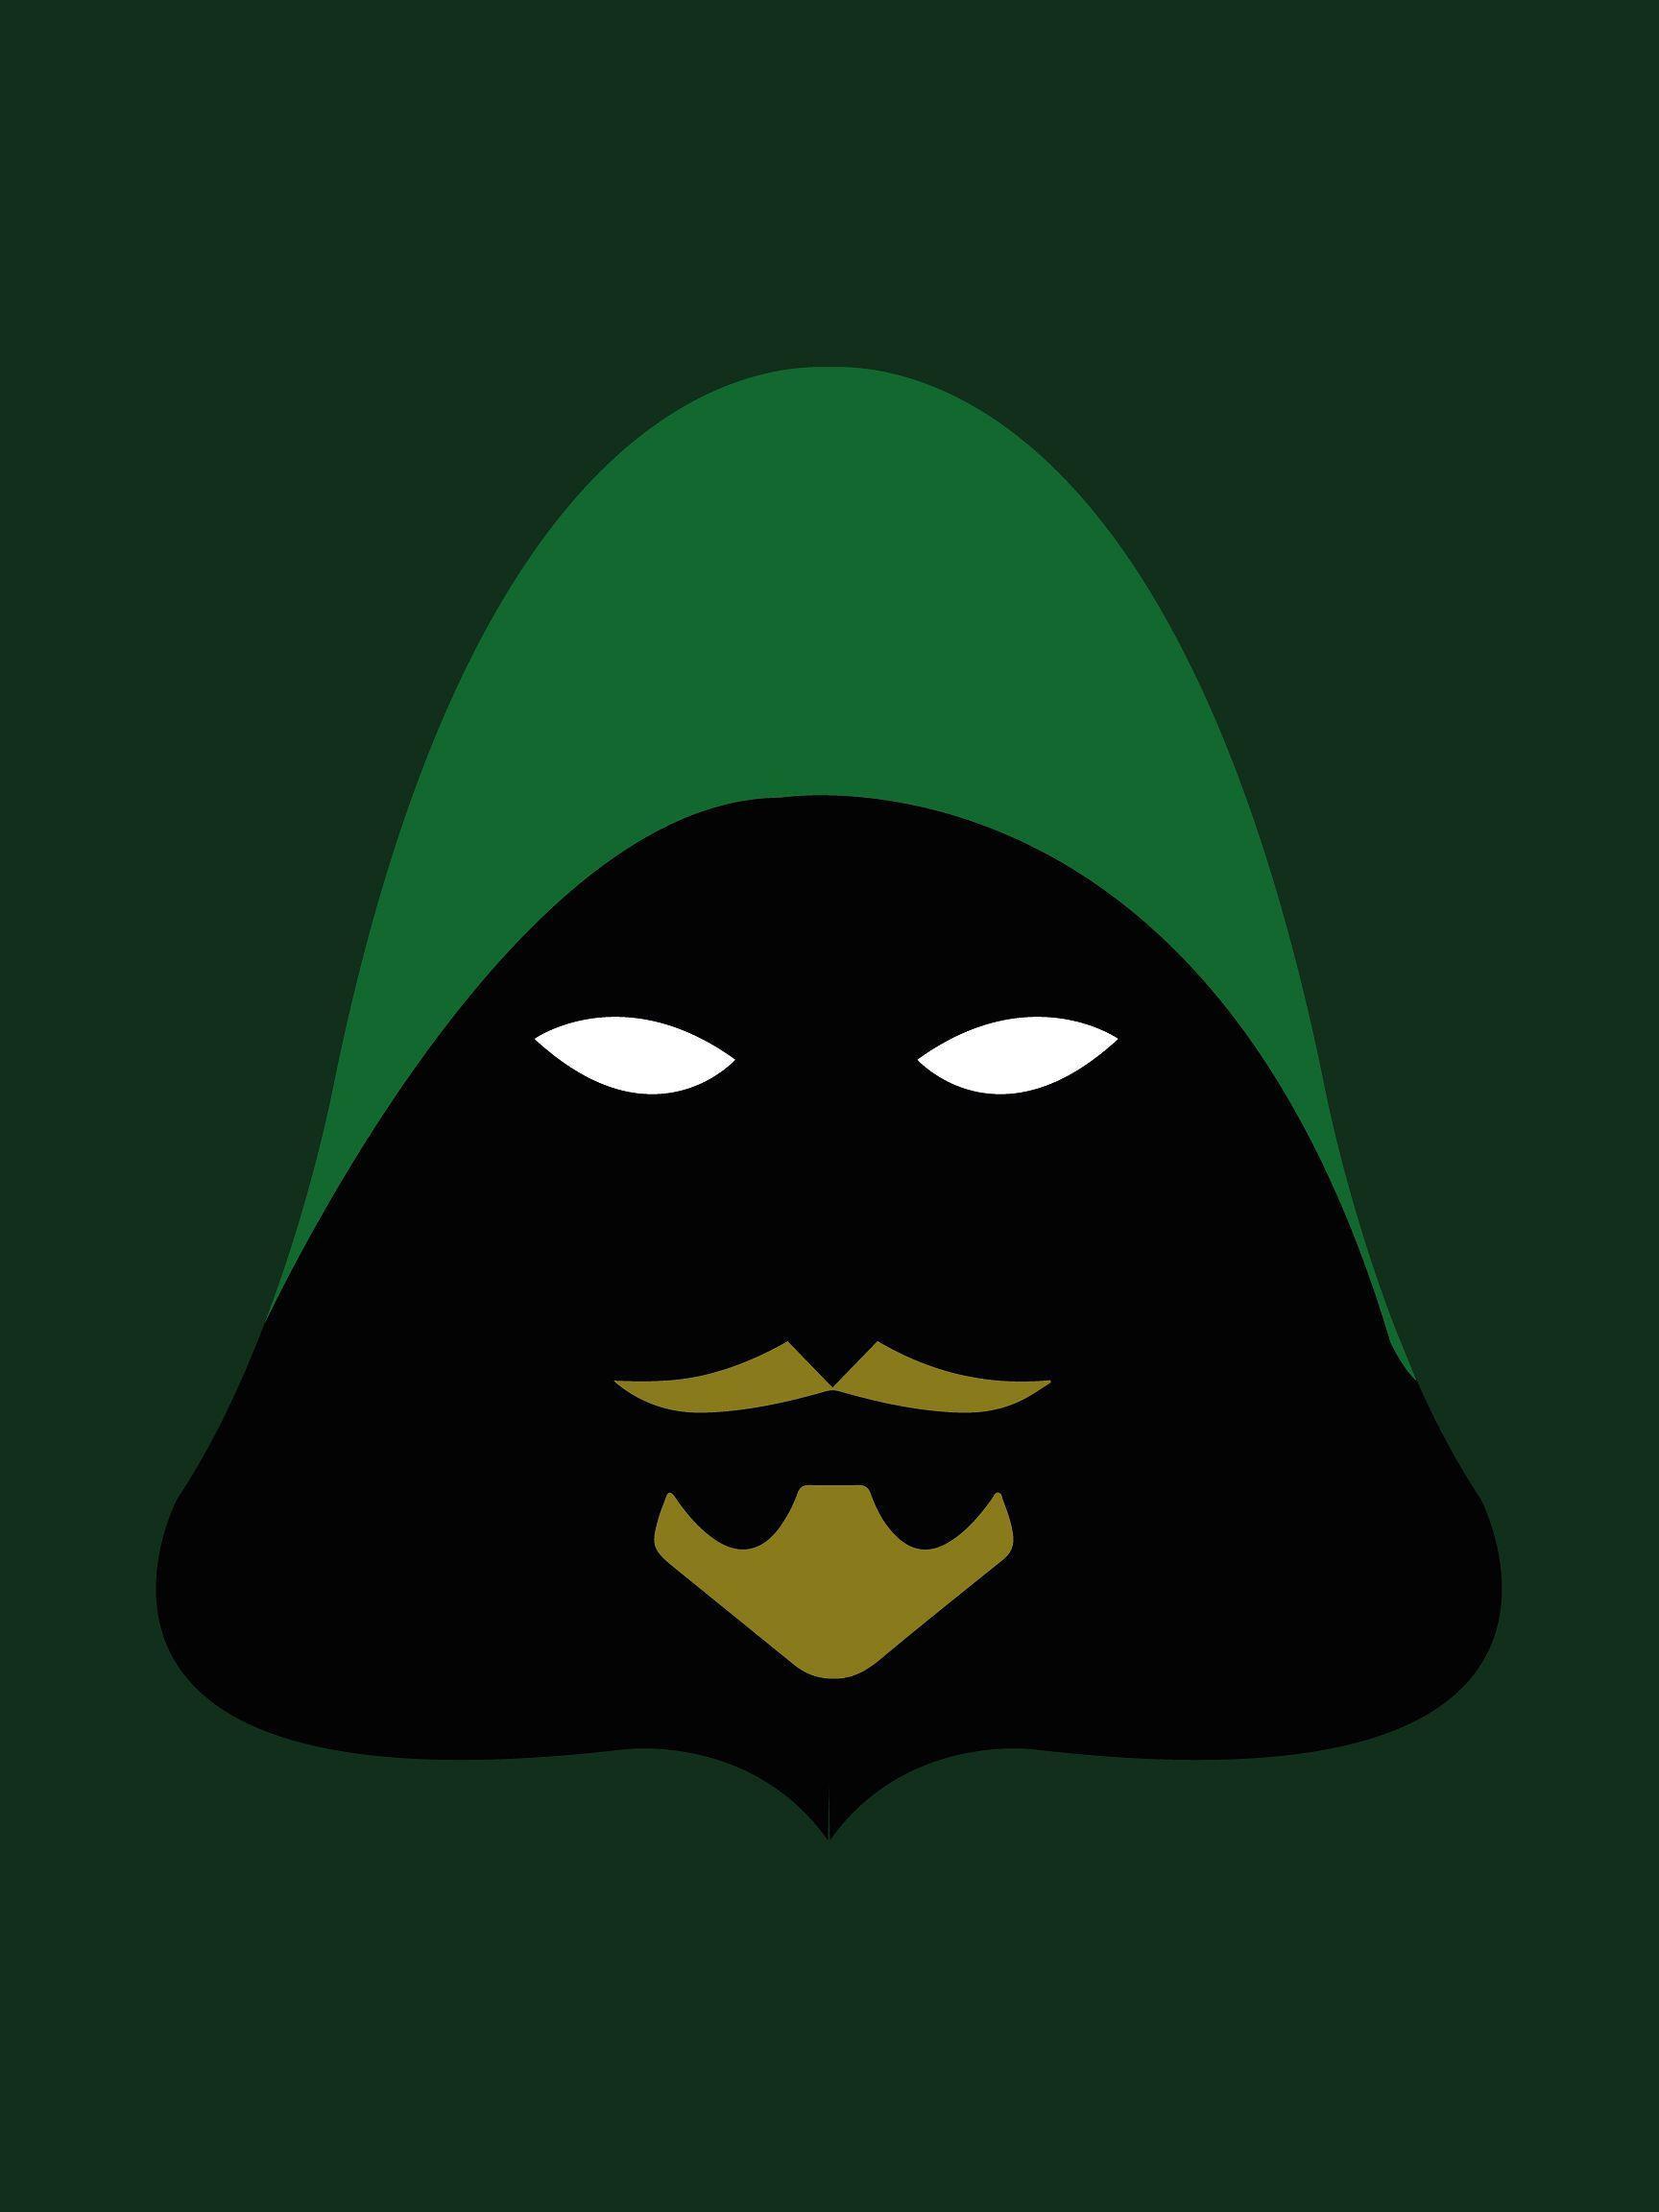 1080x1920 Green Arrow Wallpaper